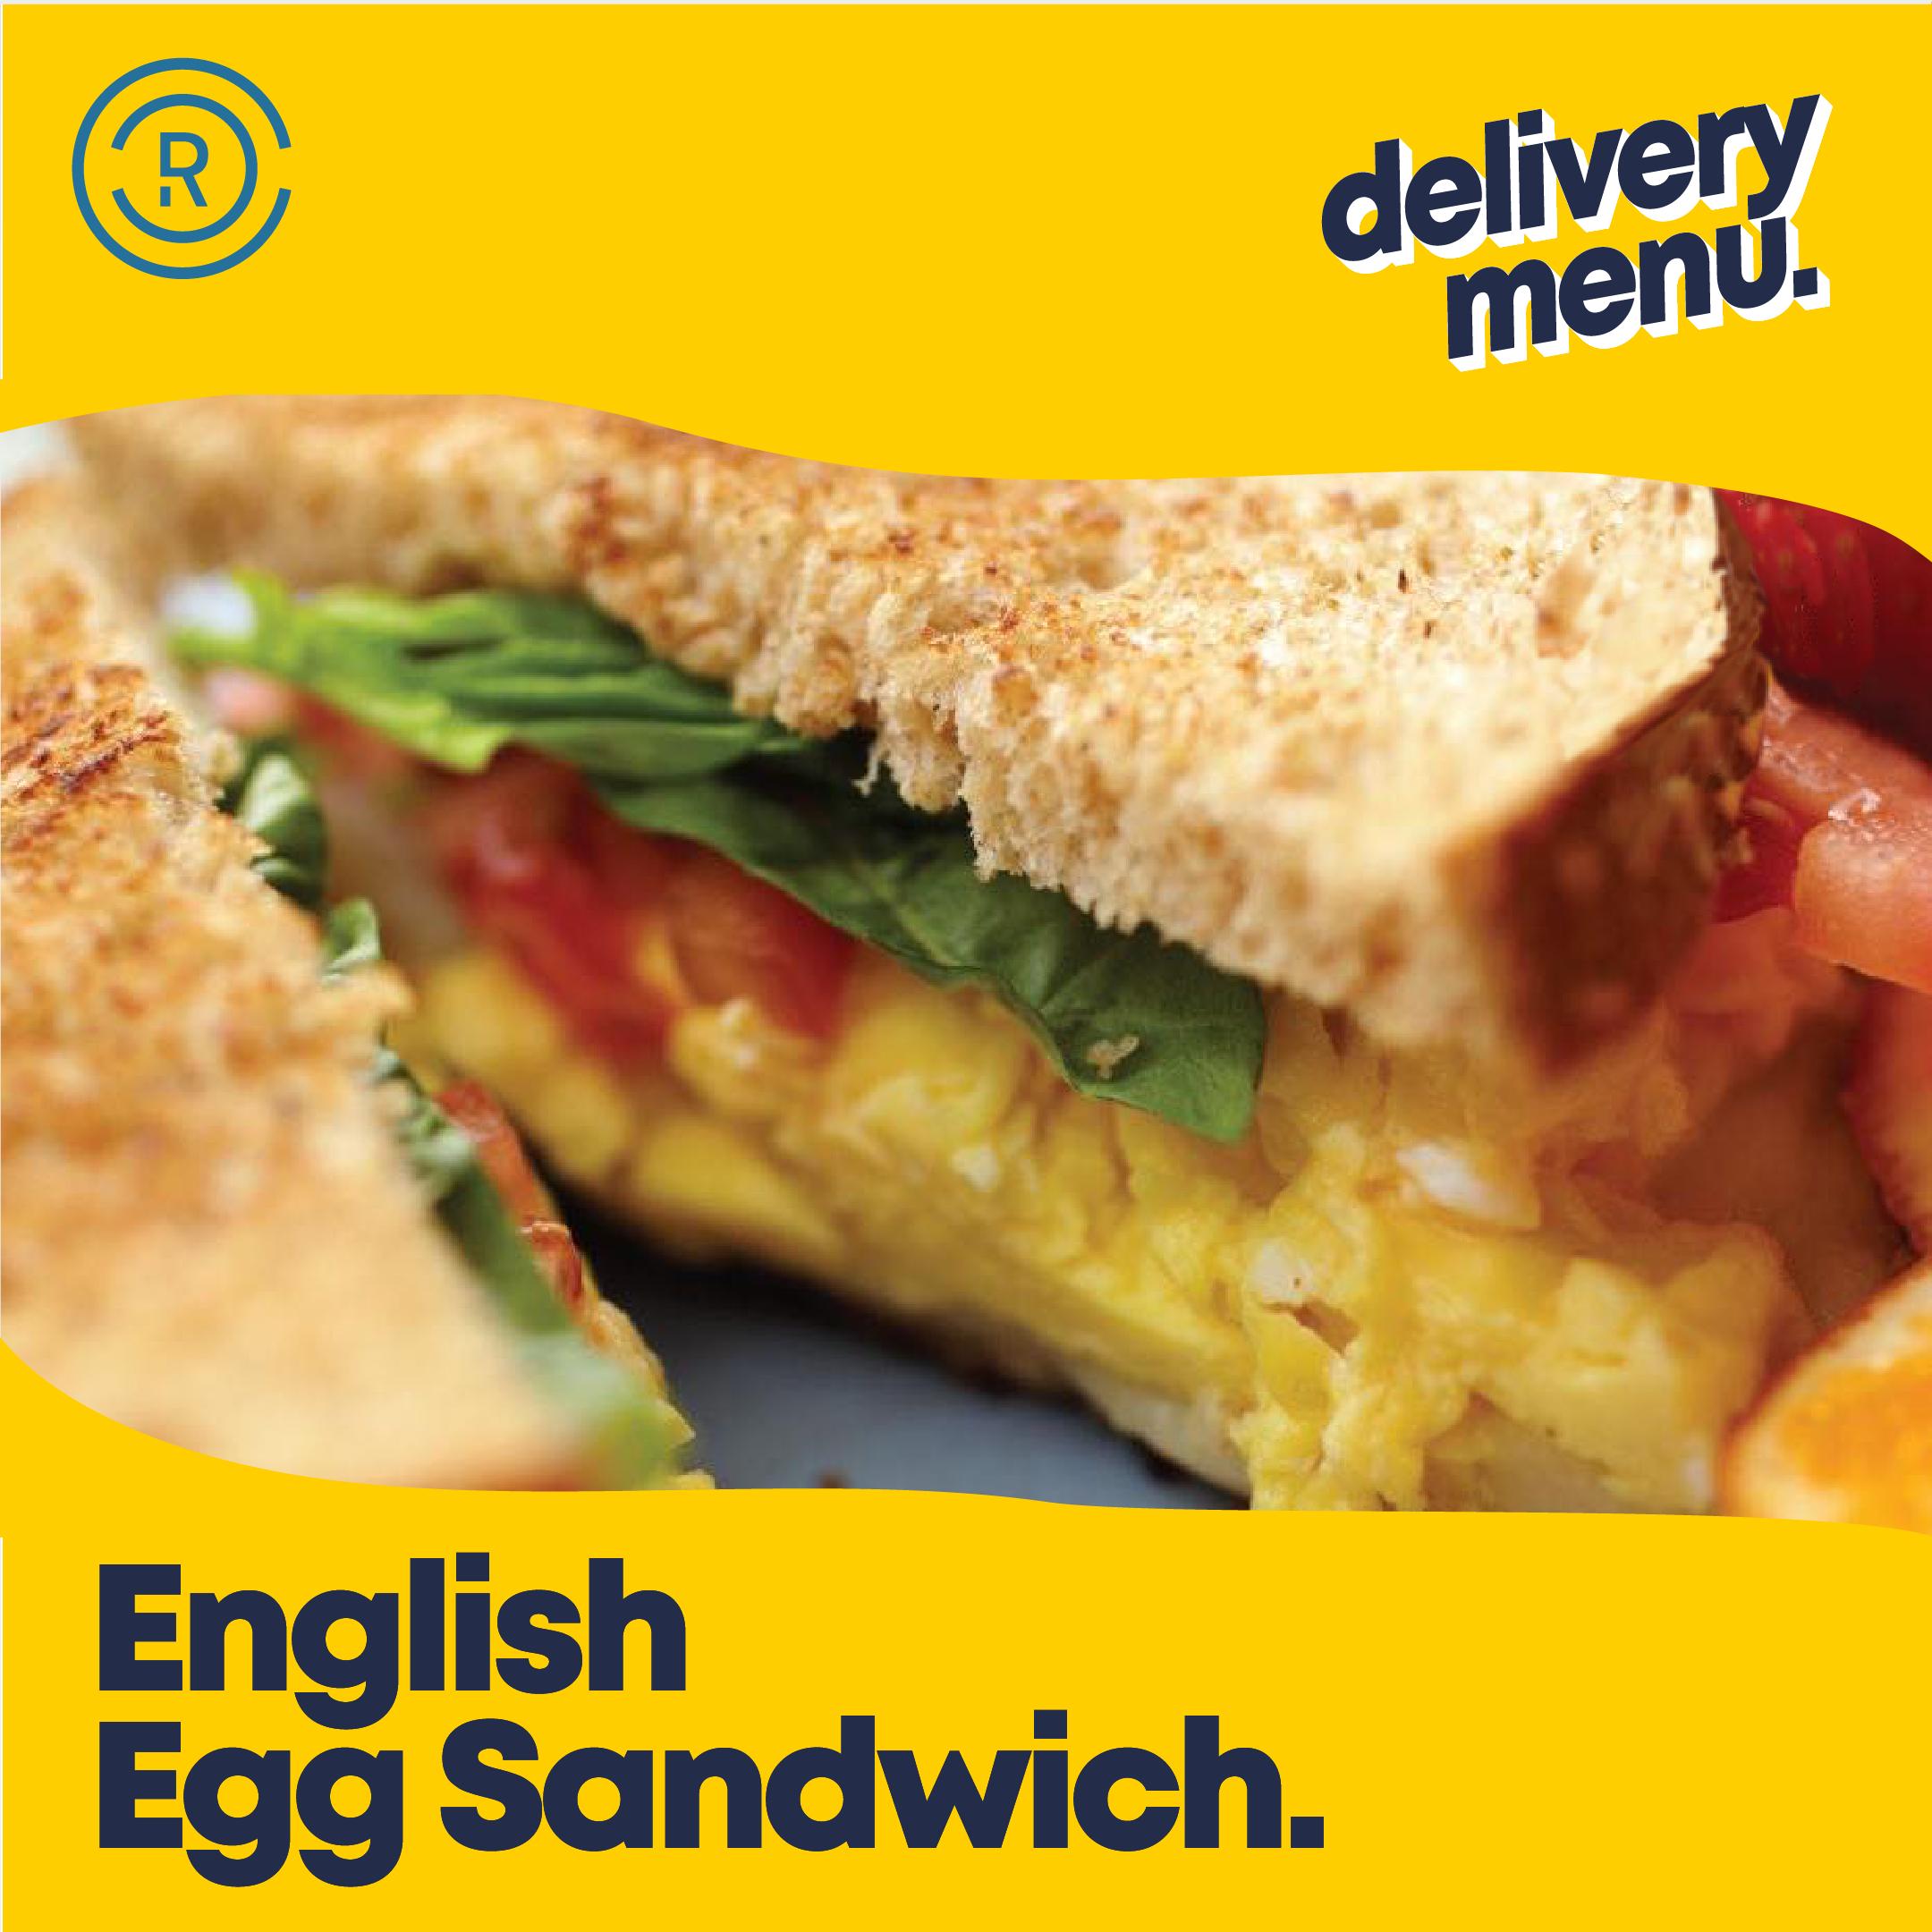 English Egg Sandwich